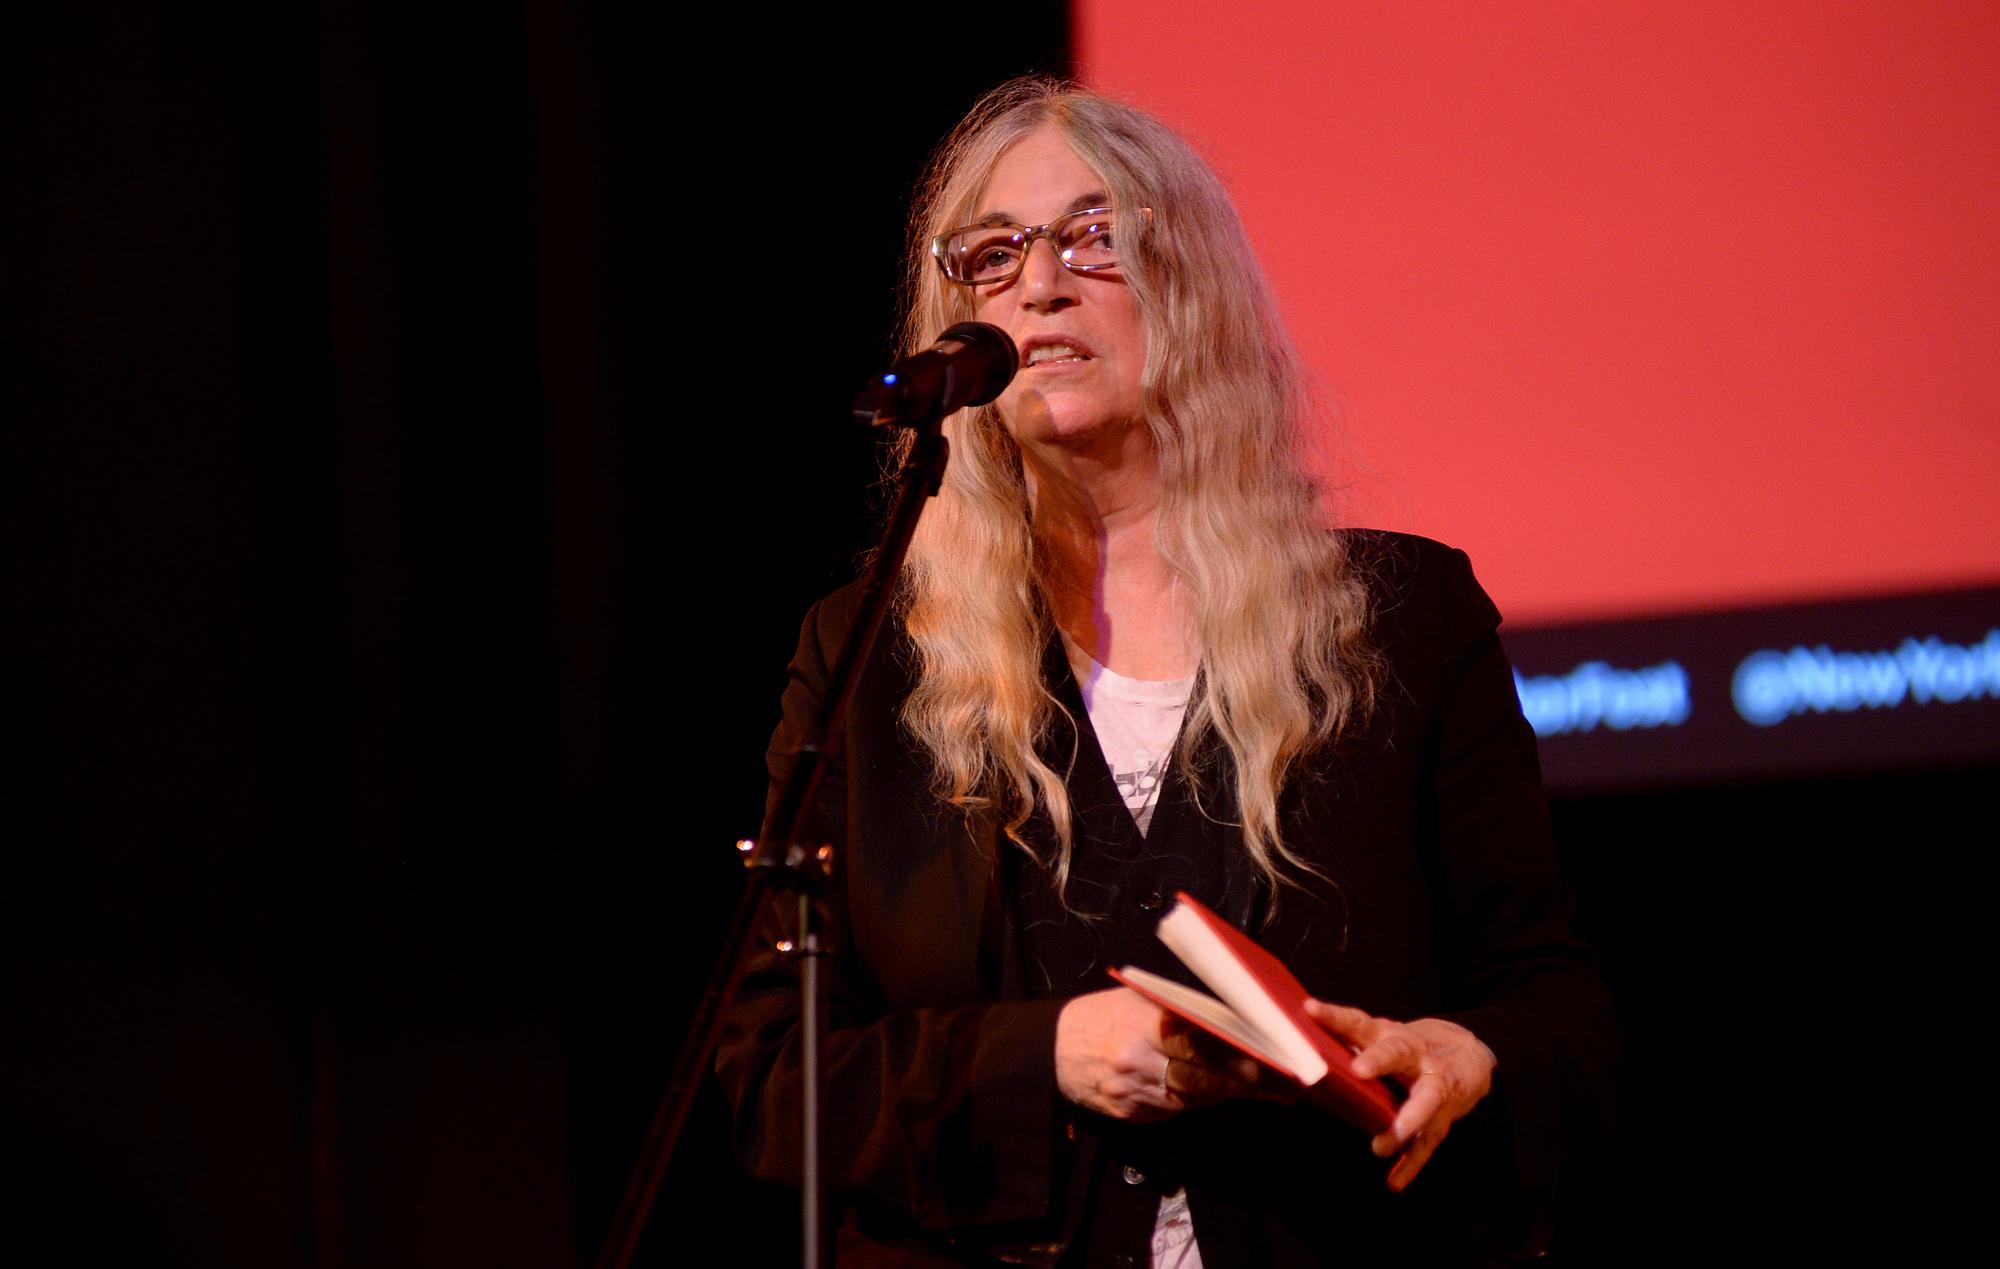 Patti Smith says reading Mark Twain made her throw up